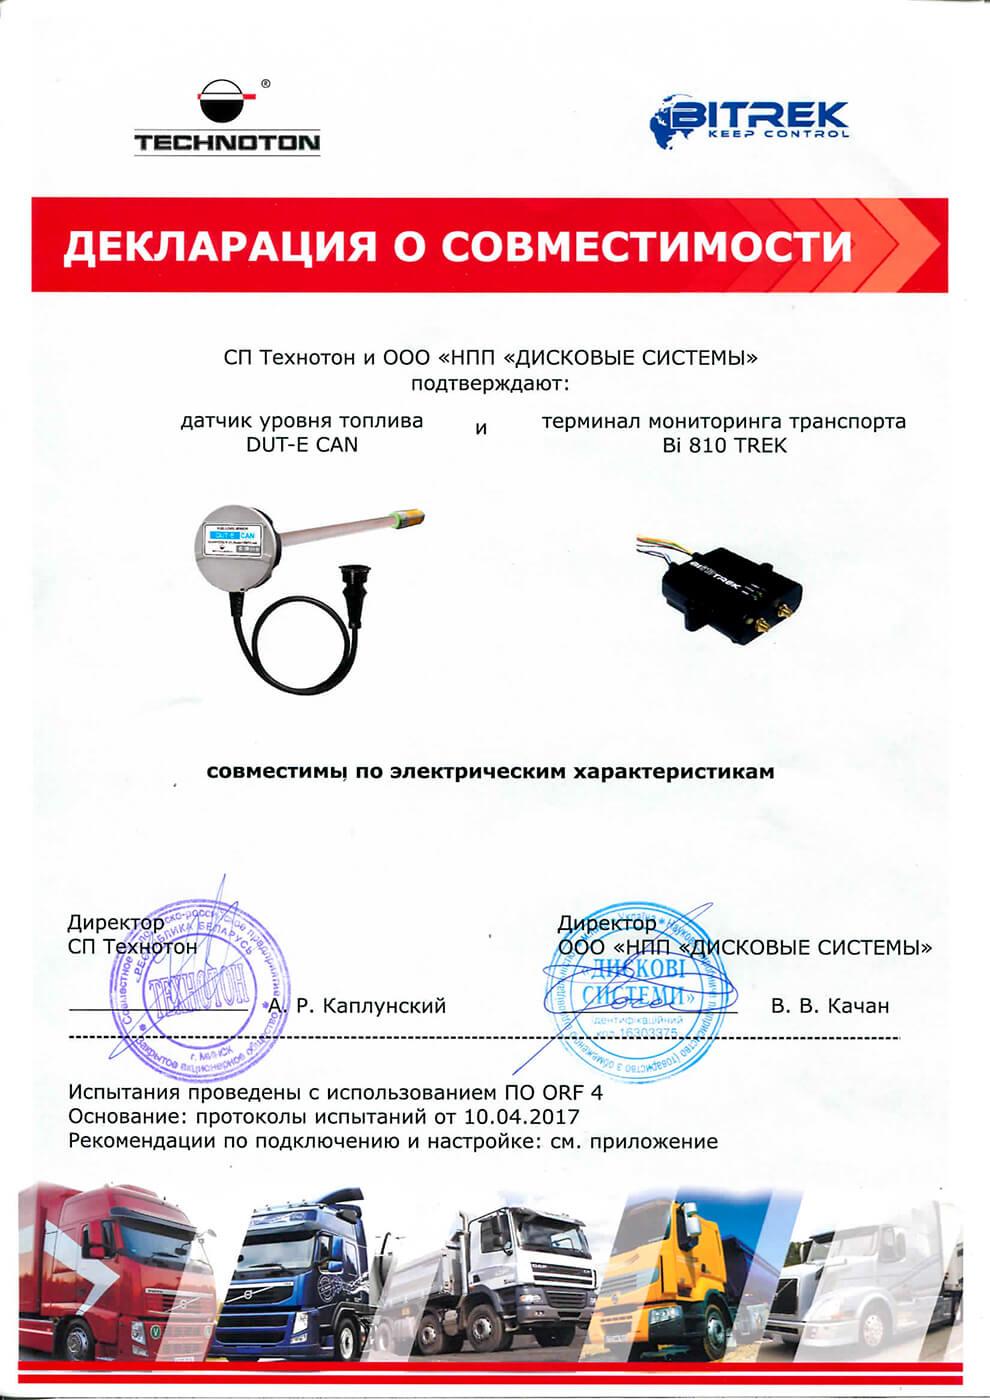 DUT-E-CAN совместим с BI-810TREK